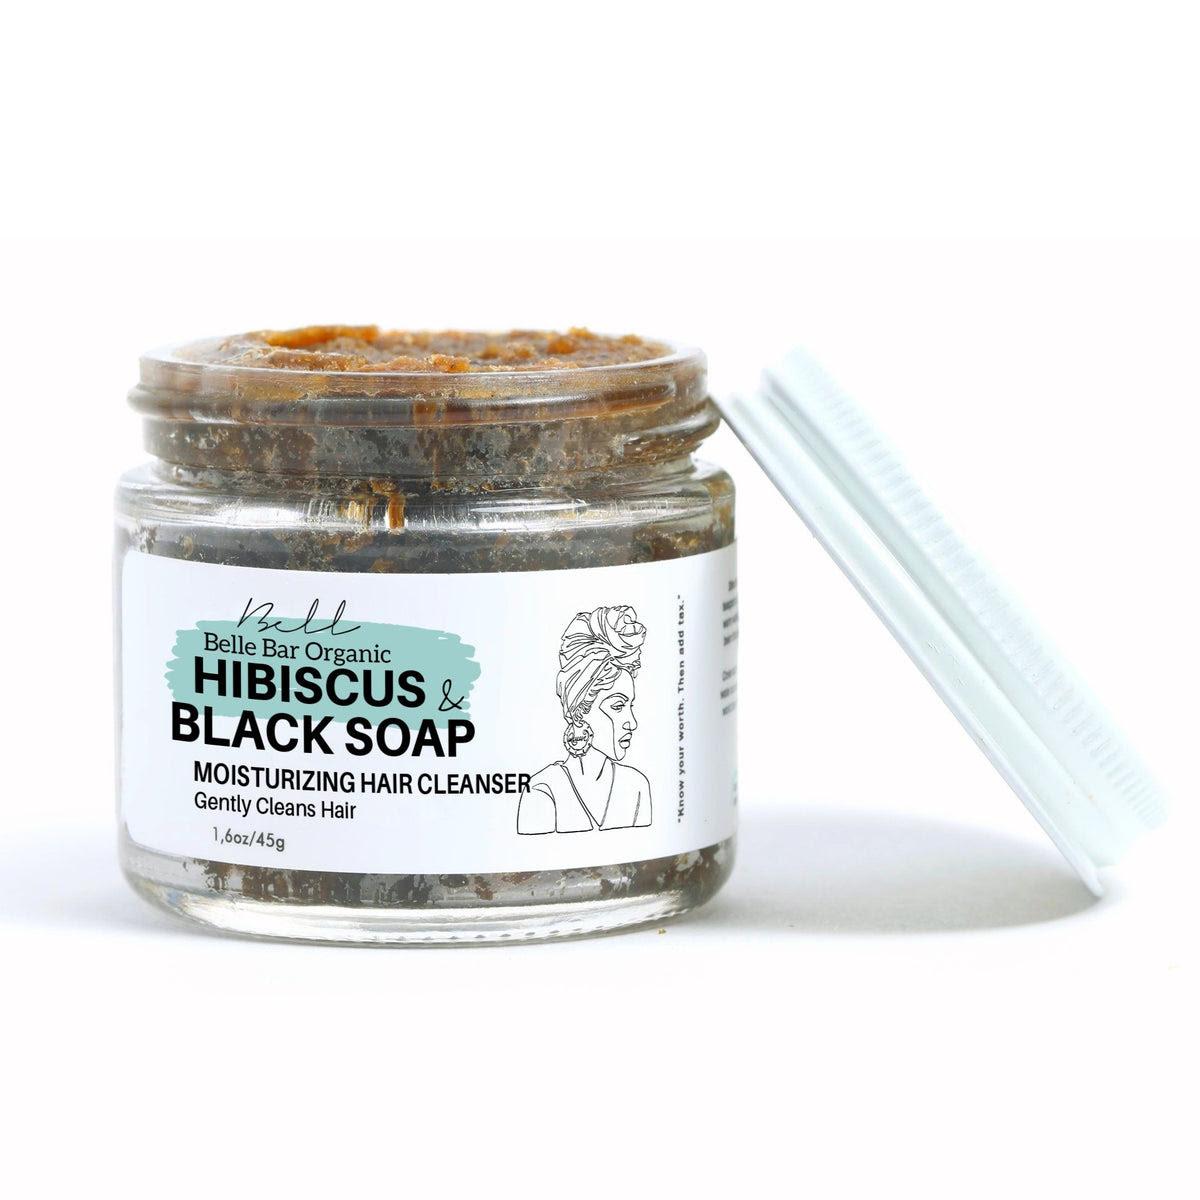 Dead Sea Salt Soap Whole Foods